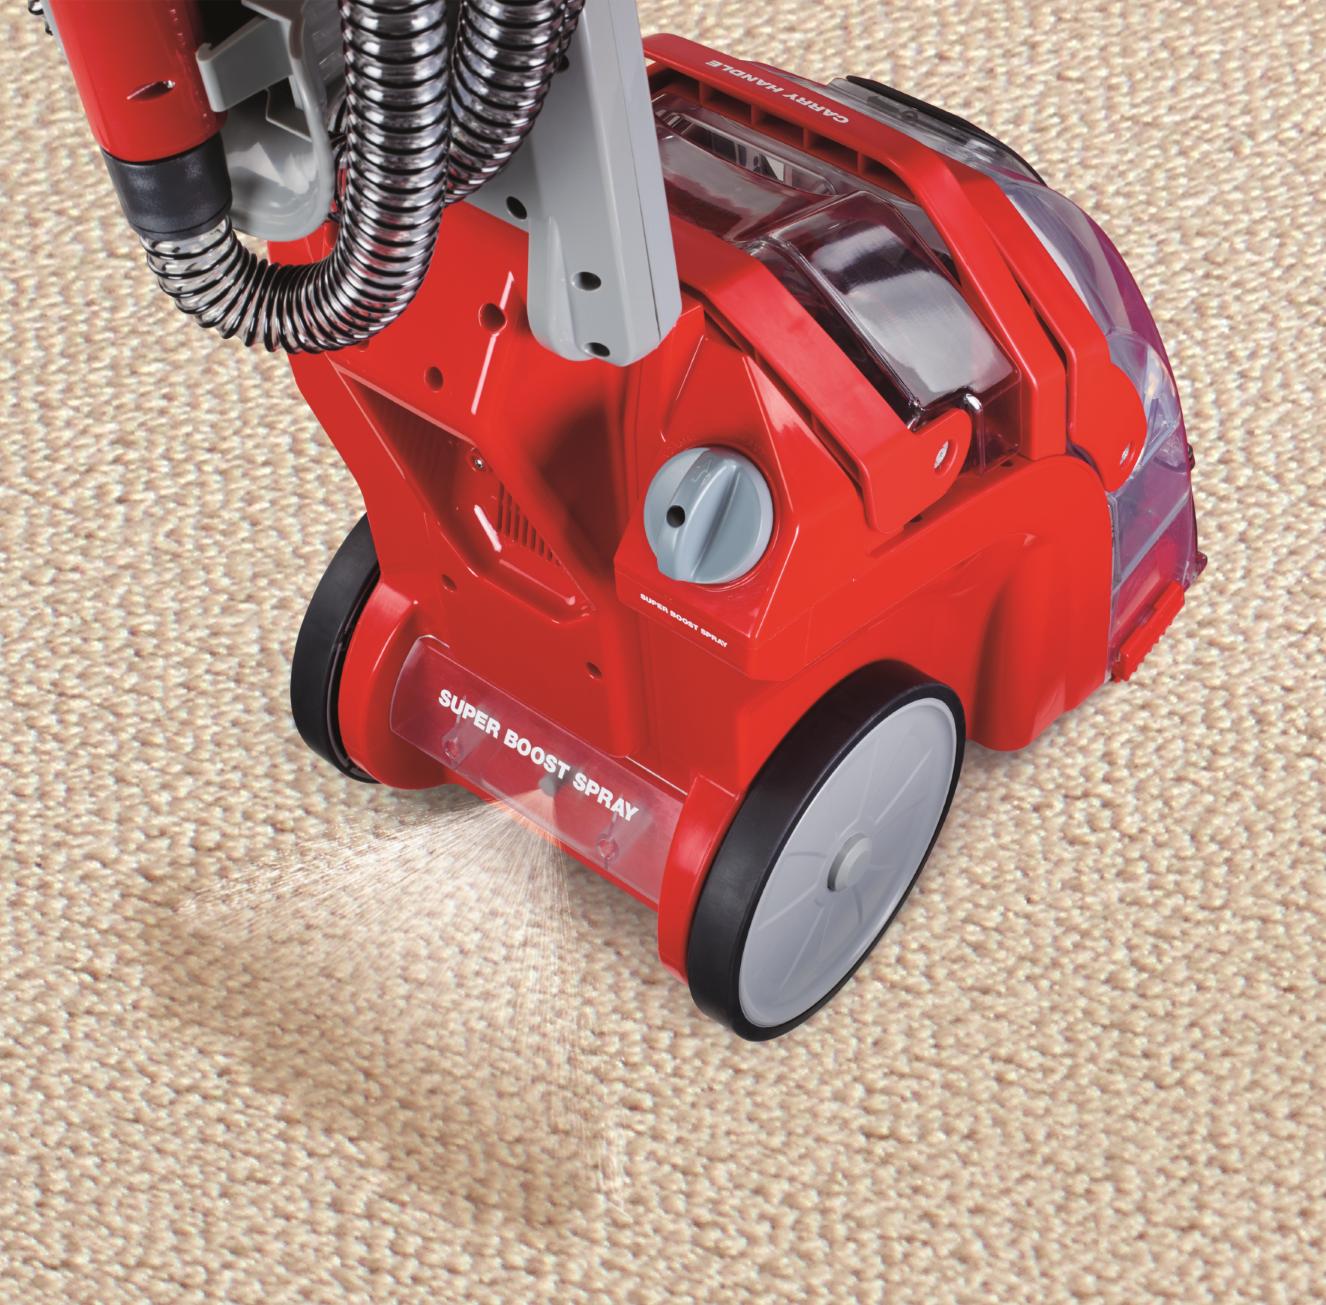 Rug Doctor Deep Carpet Cleaner Not Spraying